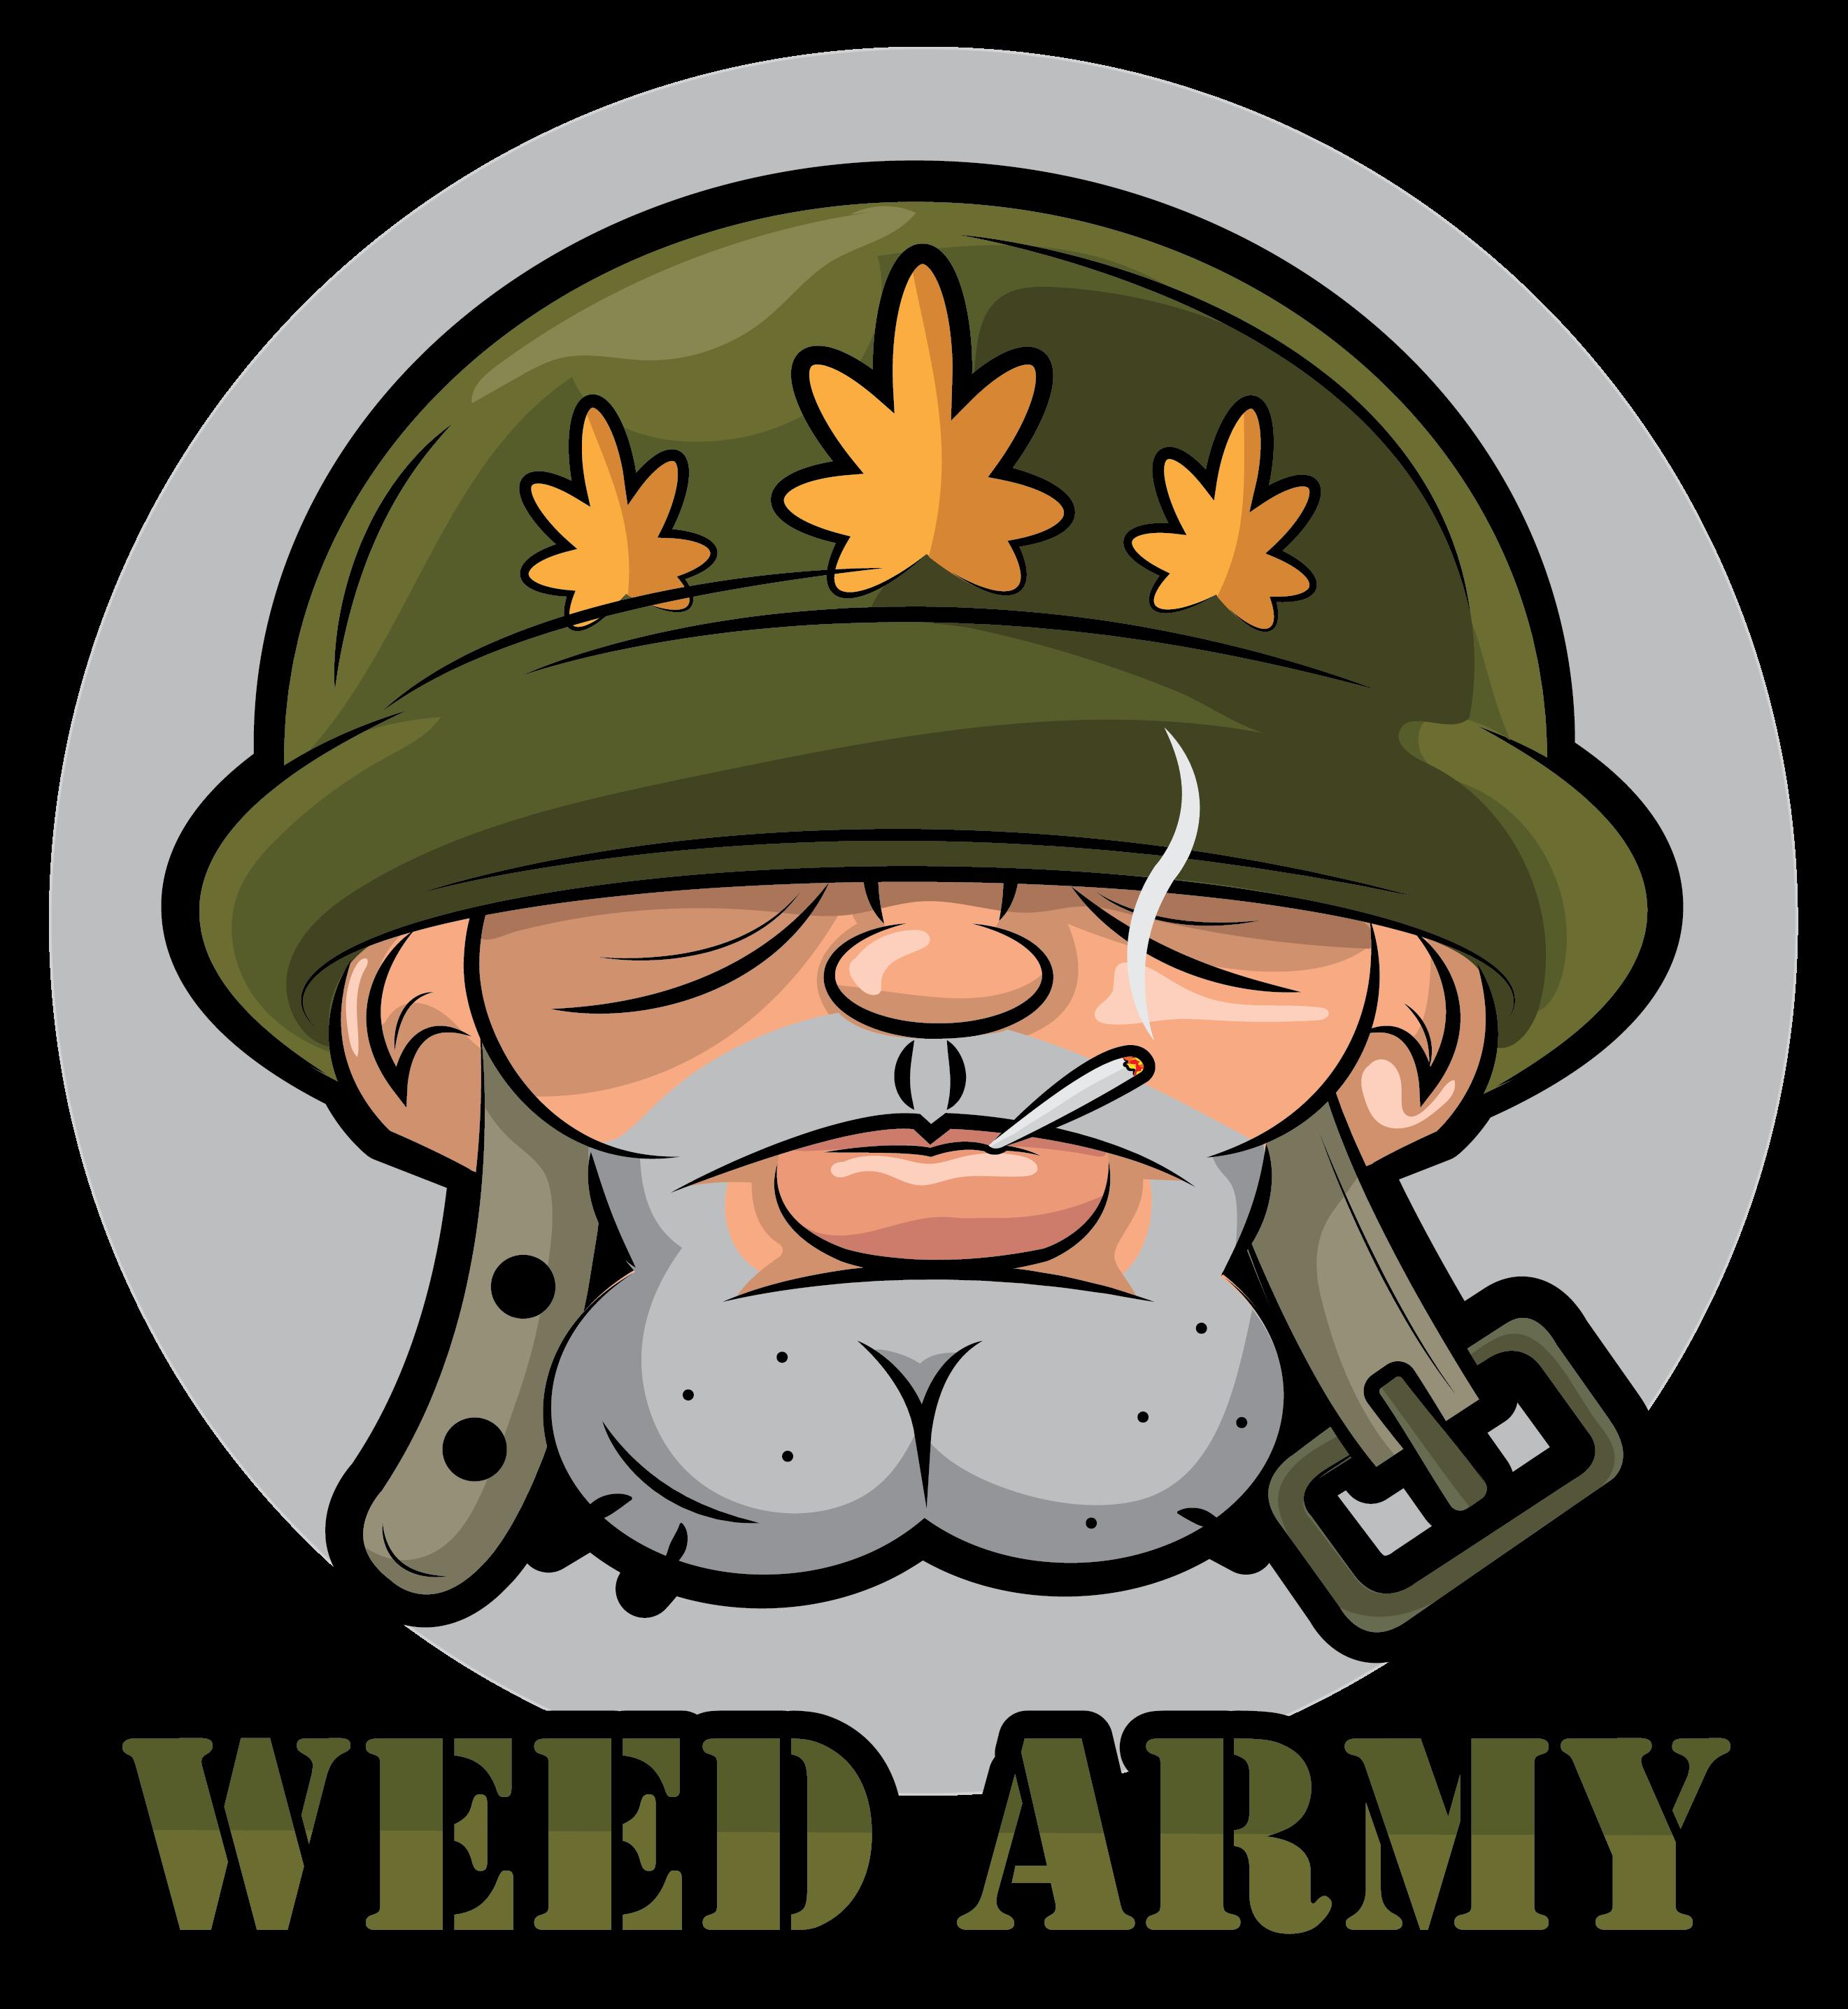 Barcelona Weed Army